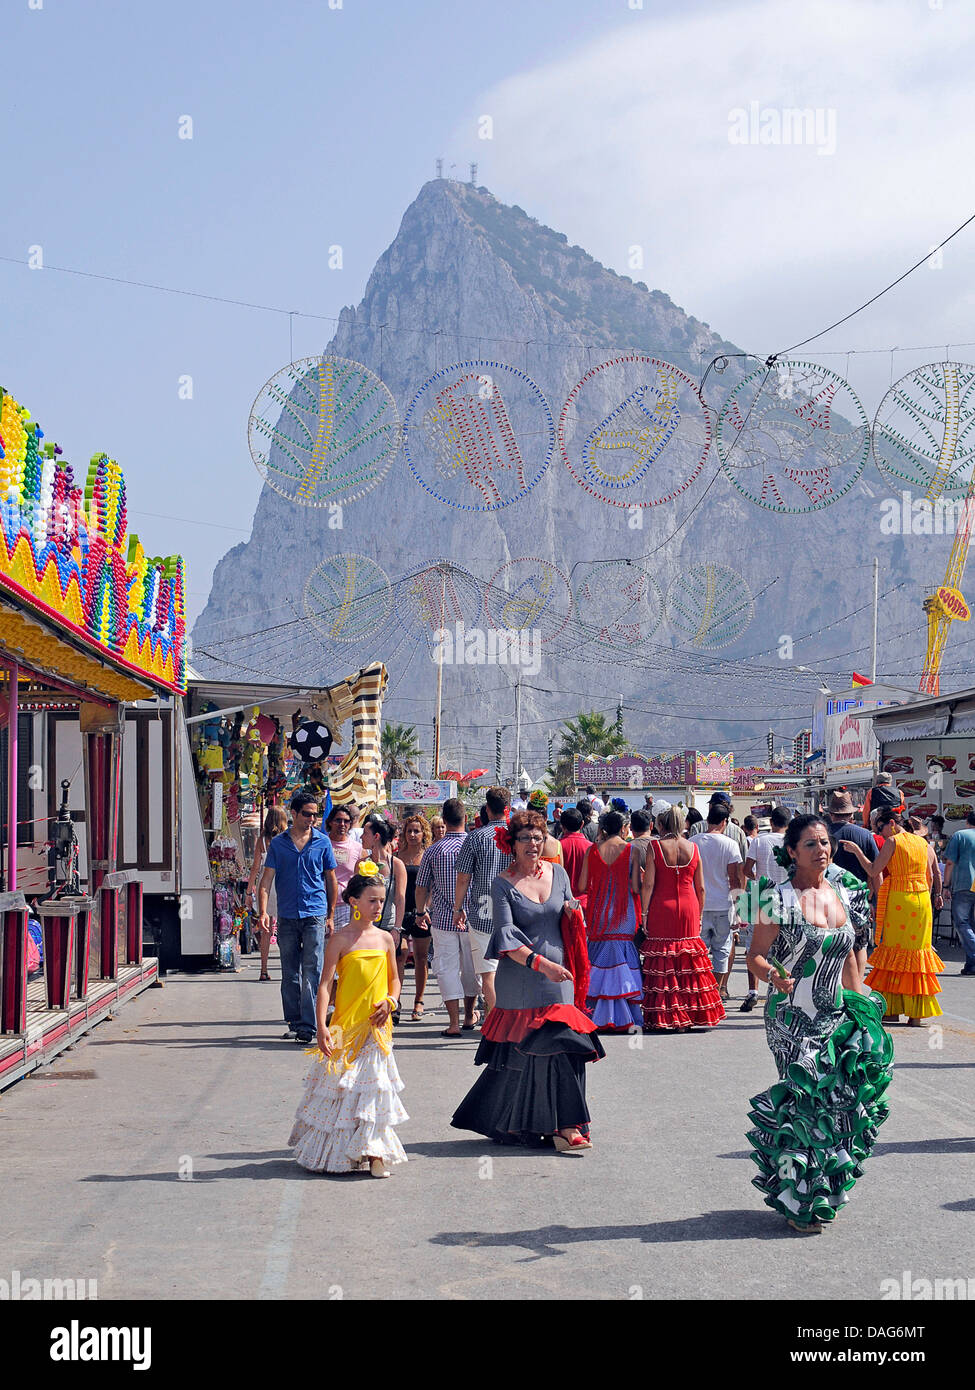 female flamenco dancers celebrating the annual fair, Rock of Gibraltar in background, Spain, La Linea De La Concepcion - Stock Image